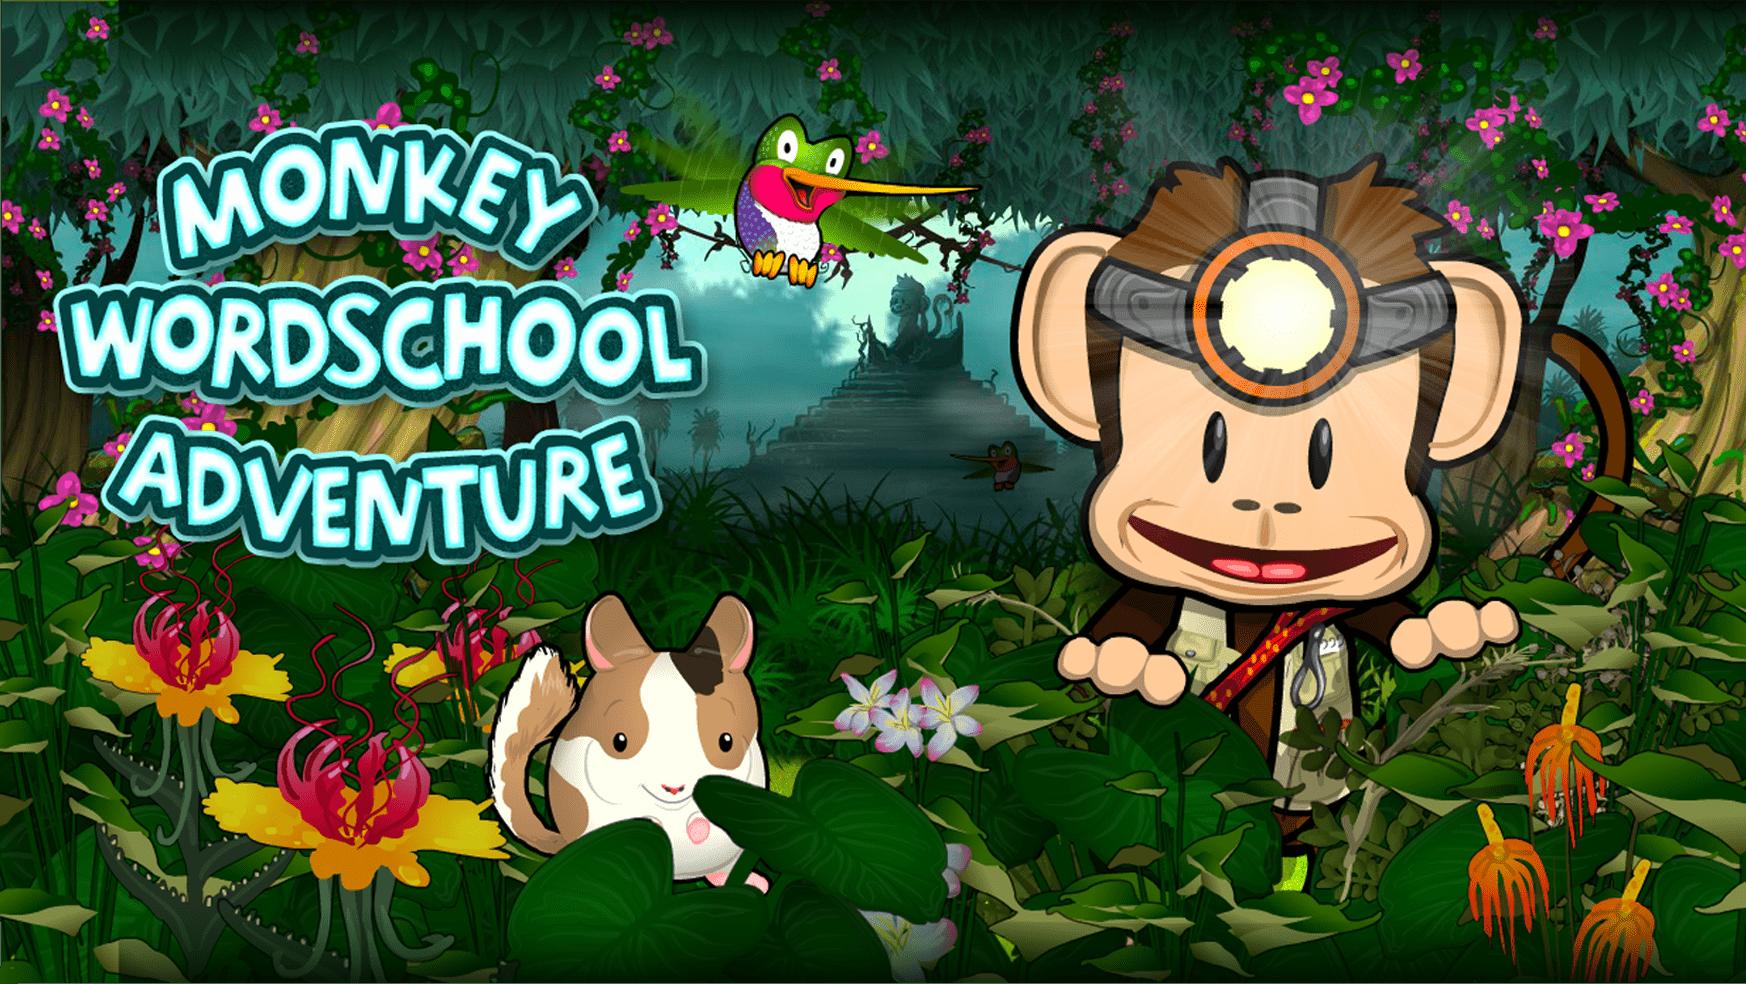 Monkey Word School Adventure